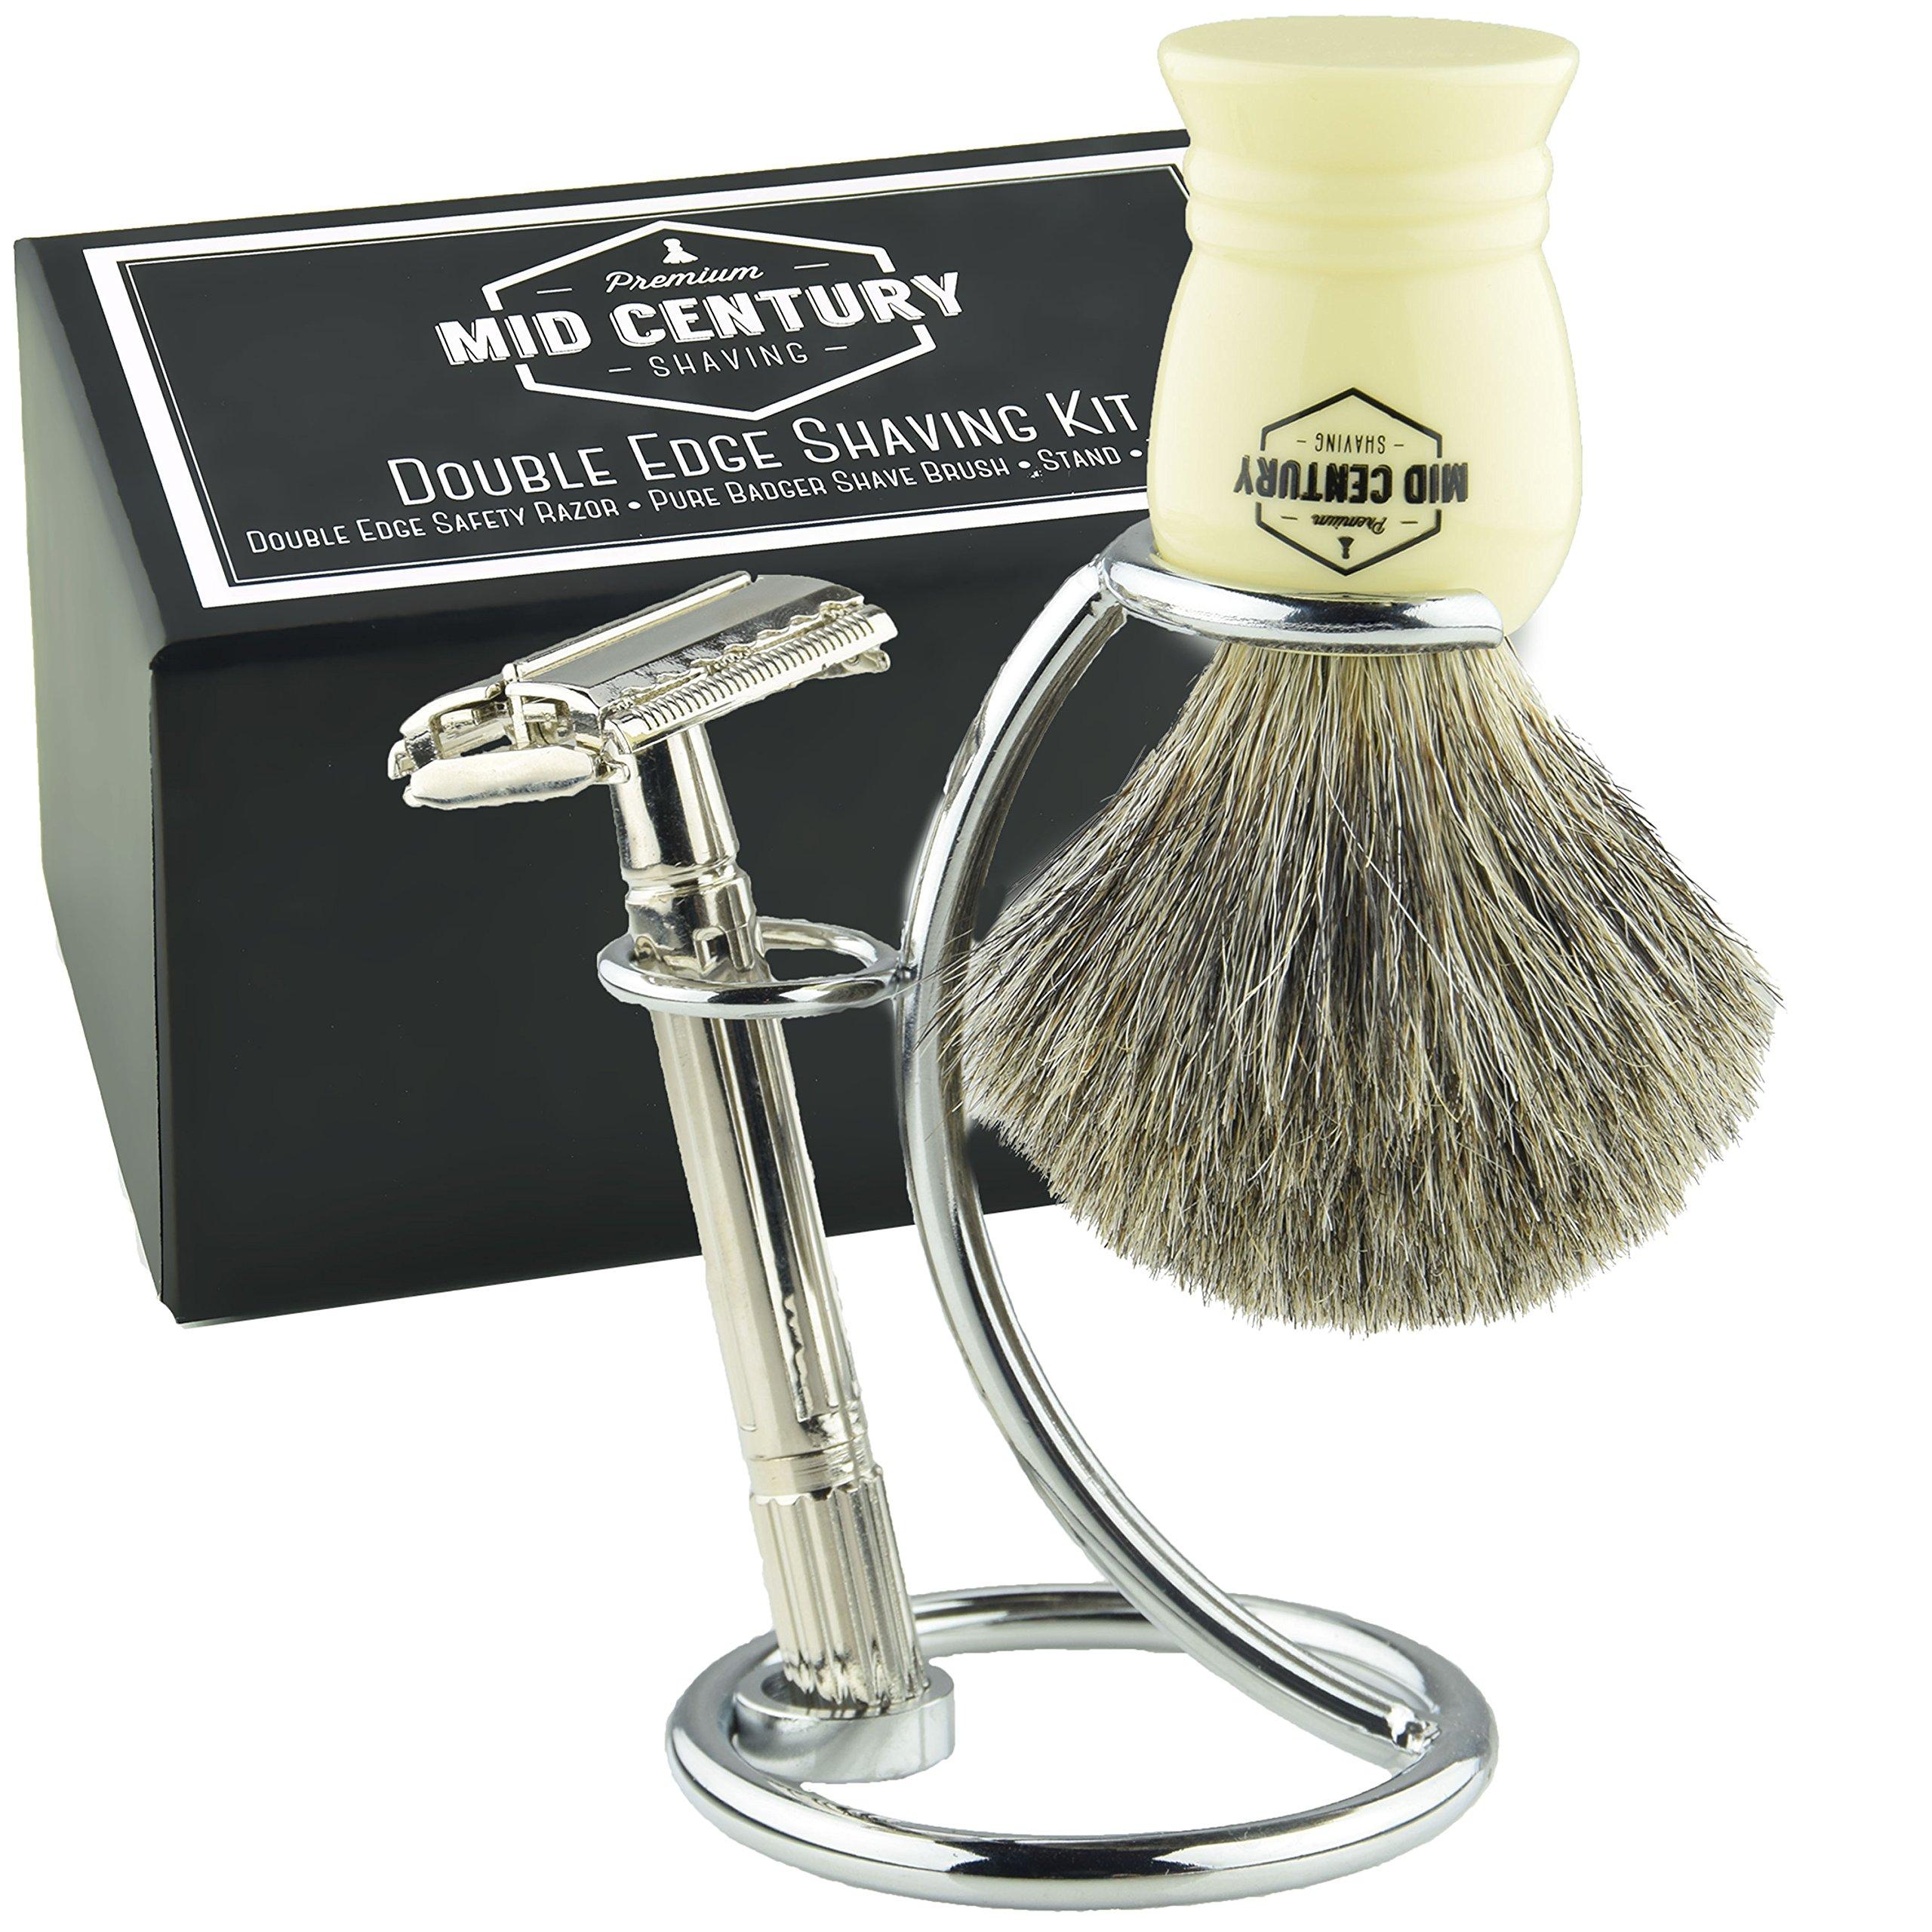 Safety Razor Shaving Kit: Double Edge Razor, Pure Badger Brush, Heavy Chrome Stand with Travel Case; Complete Wet Shave Gift Set (Ivory)